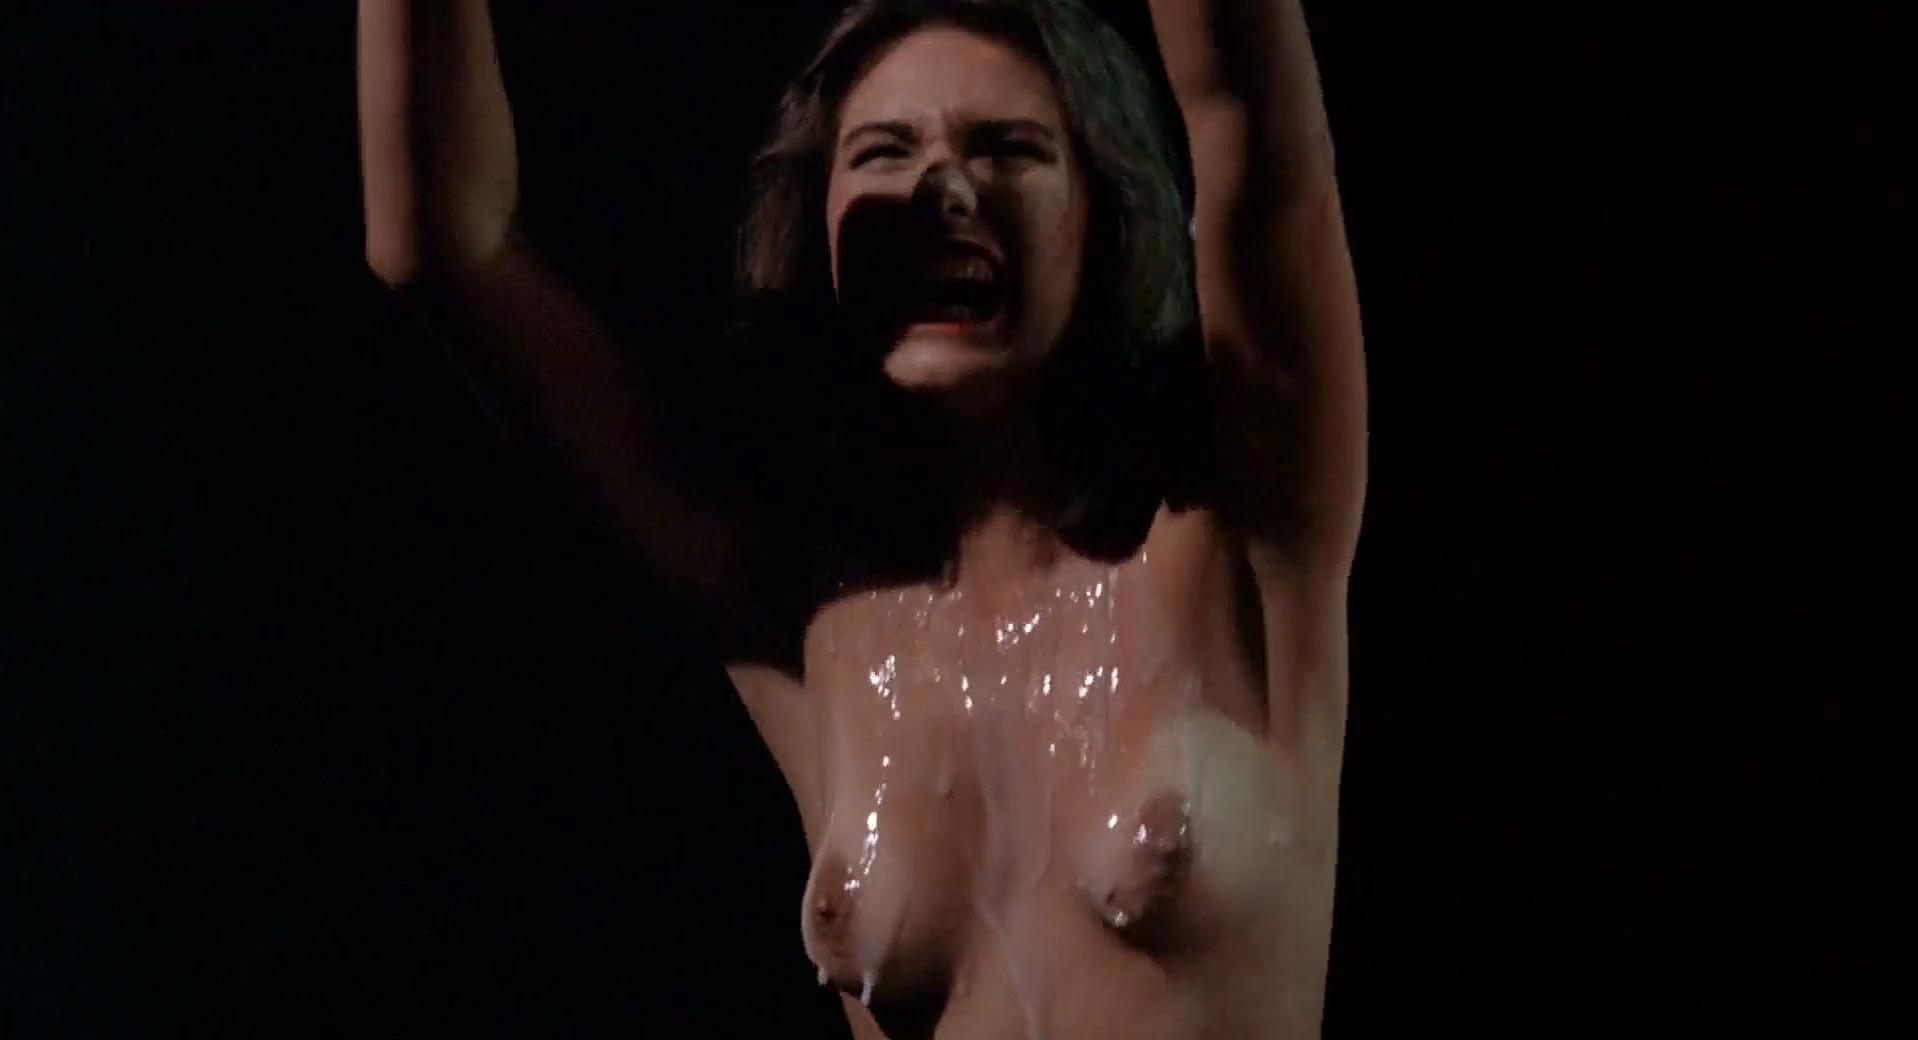 Frances Raines nude, LeeAnne Baker nude, Natalie O'Connell nude, Amy Brentano nude, Adriane Lee nude - Breeders (1986)